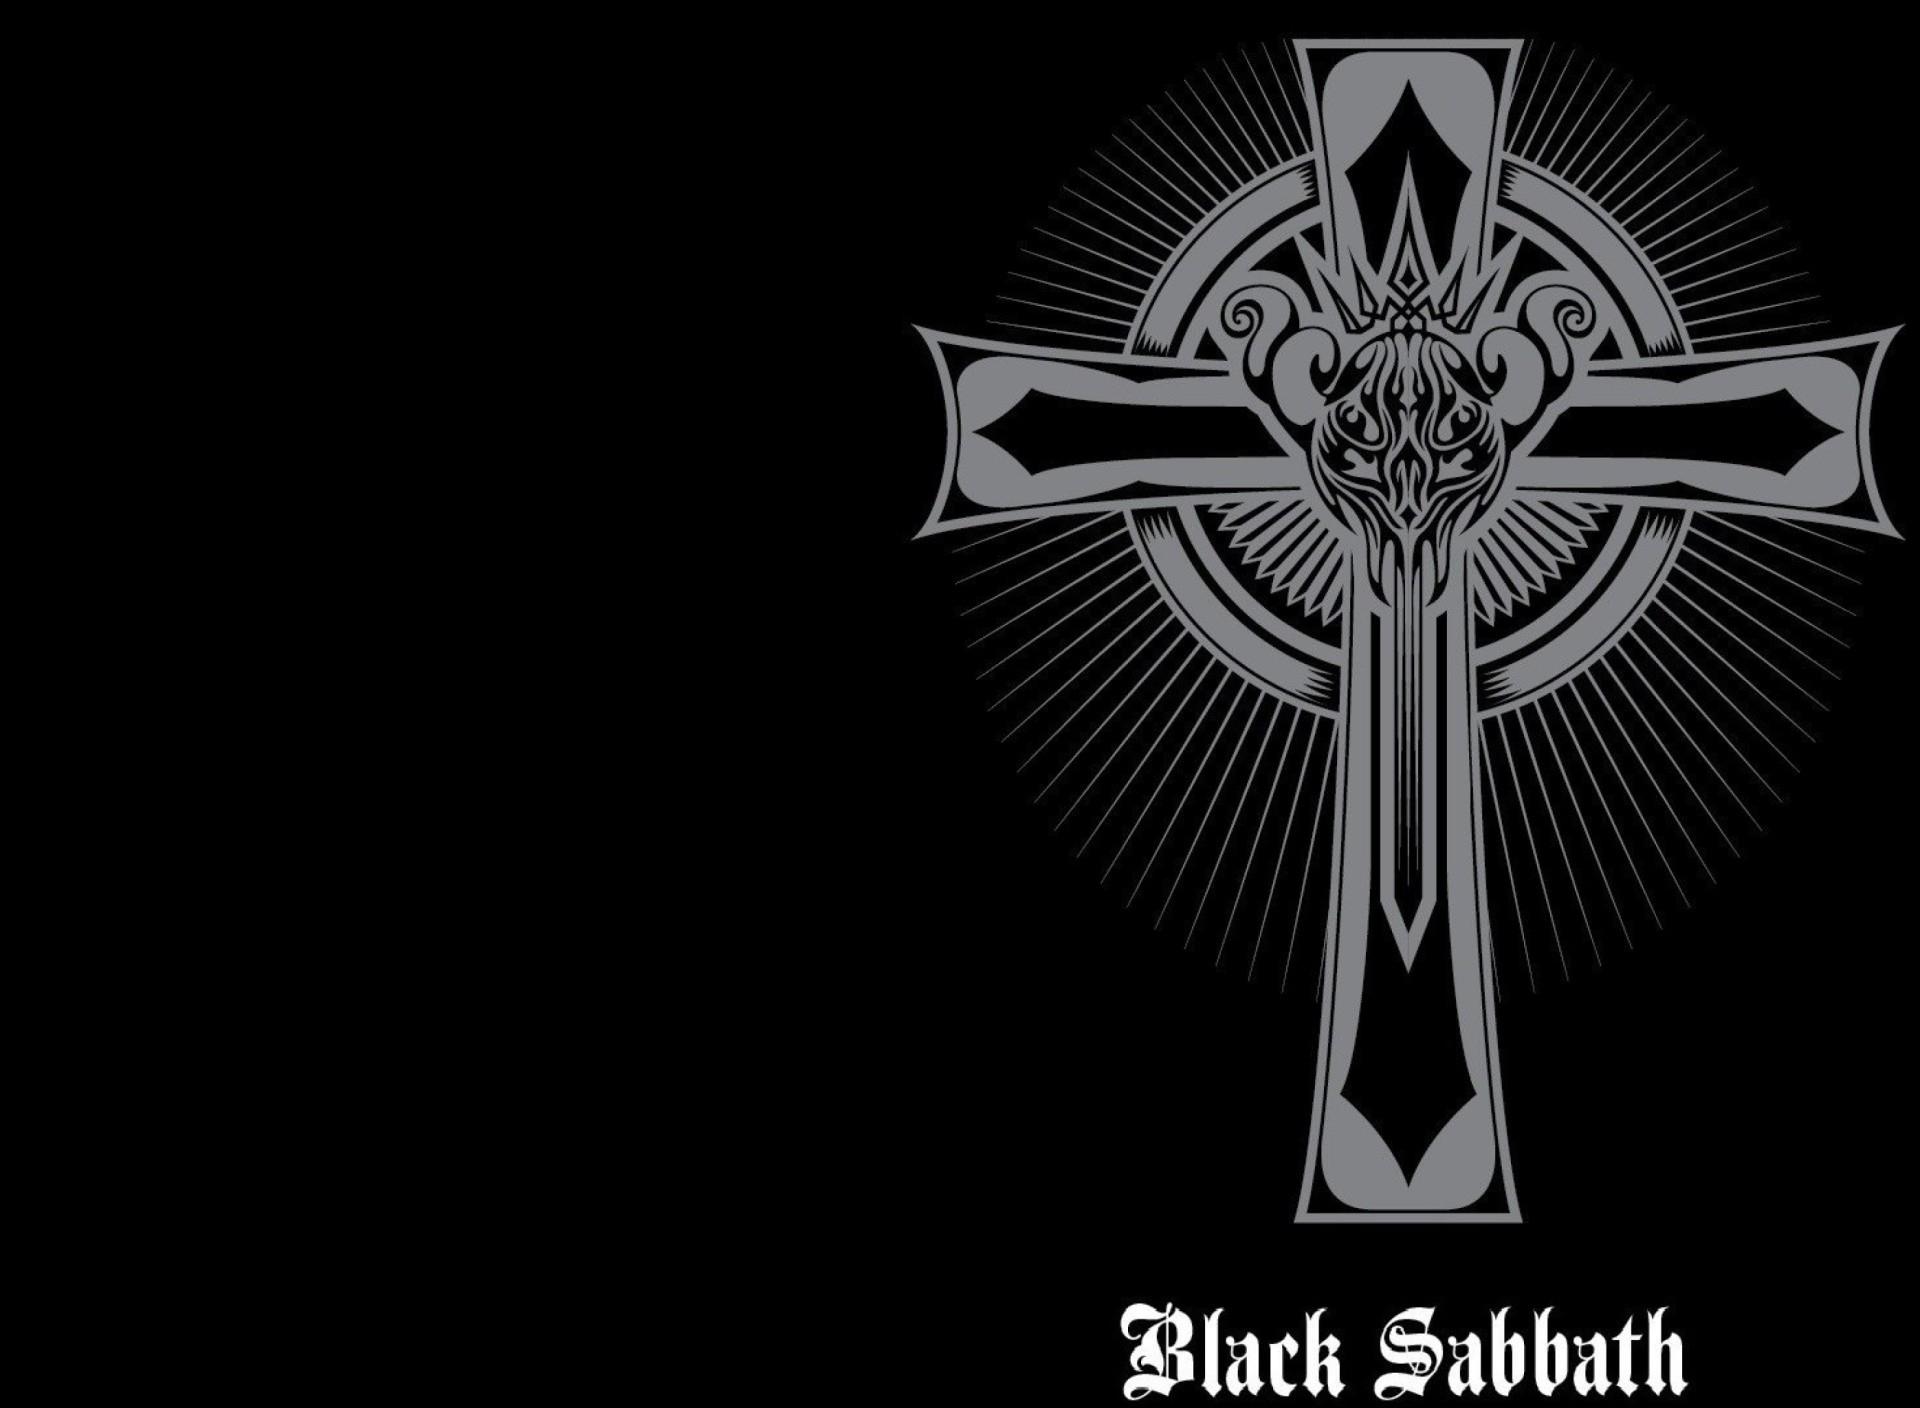 black sabbath wallpapers  u00b7 u2460 wallpapertag